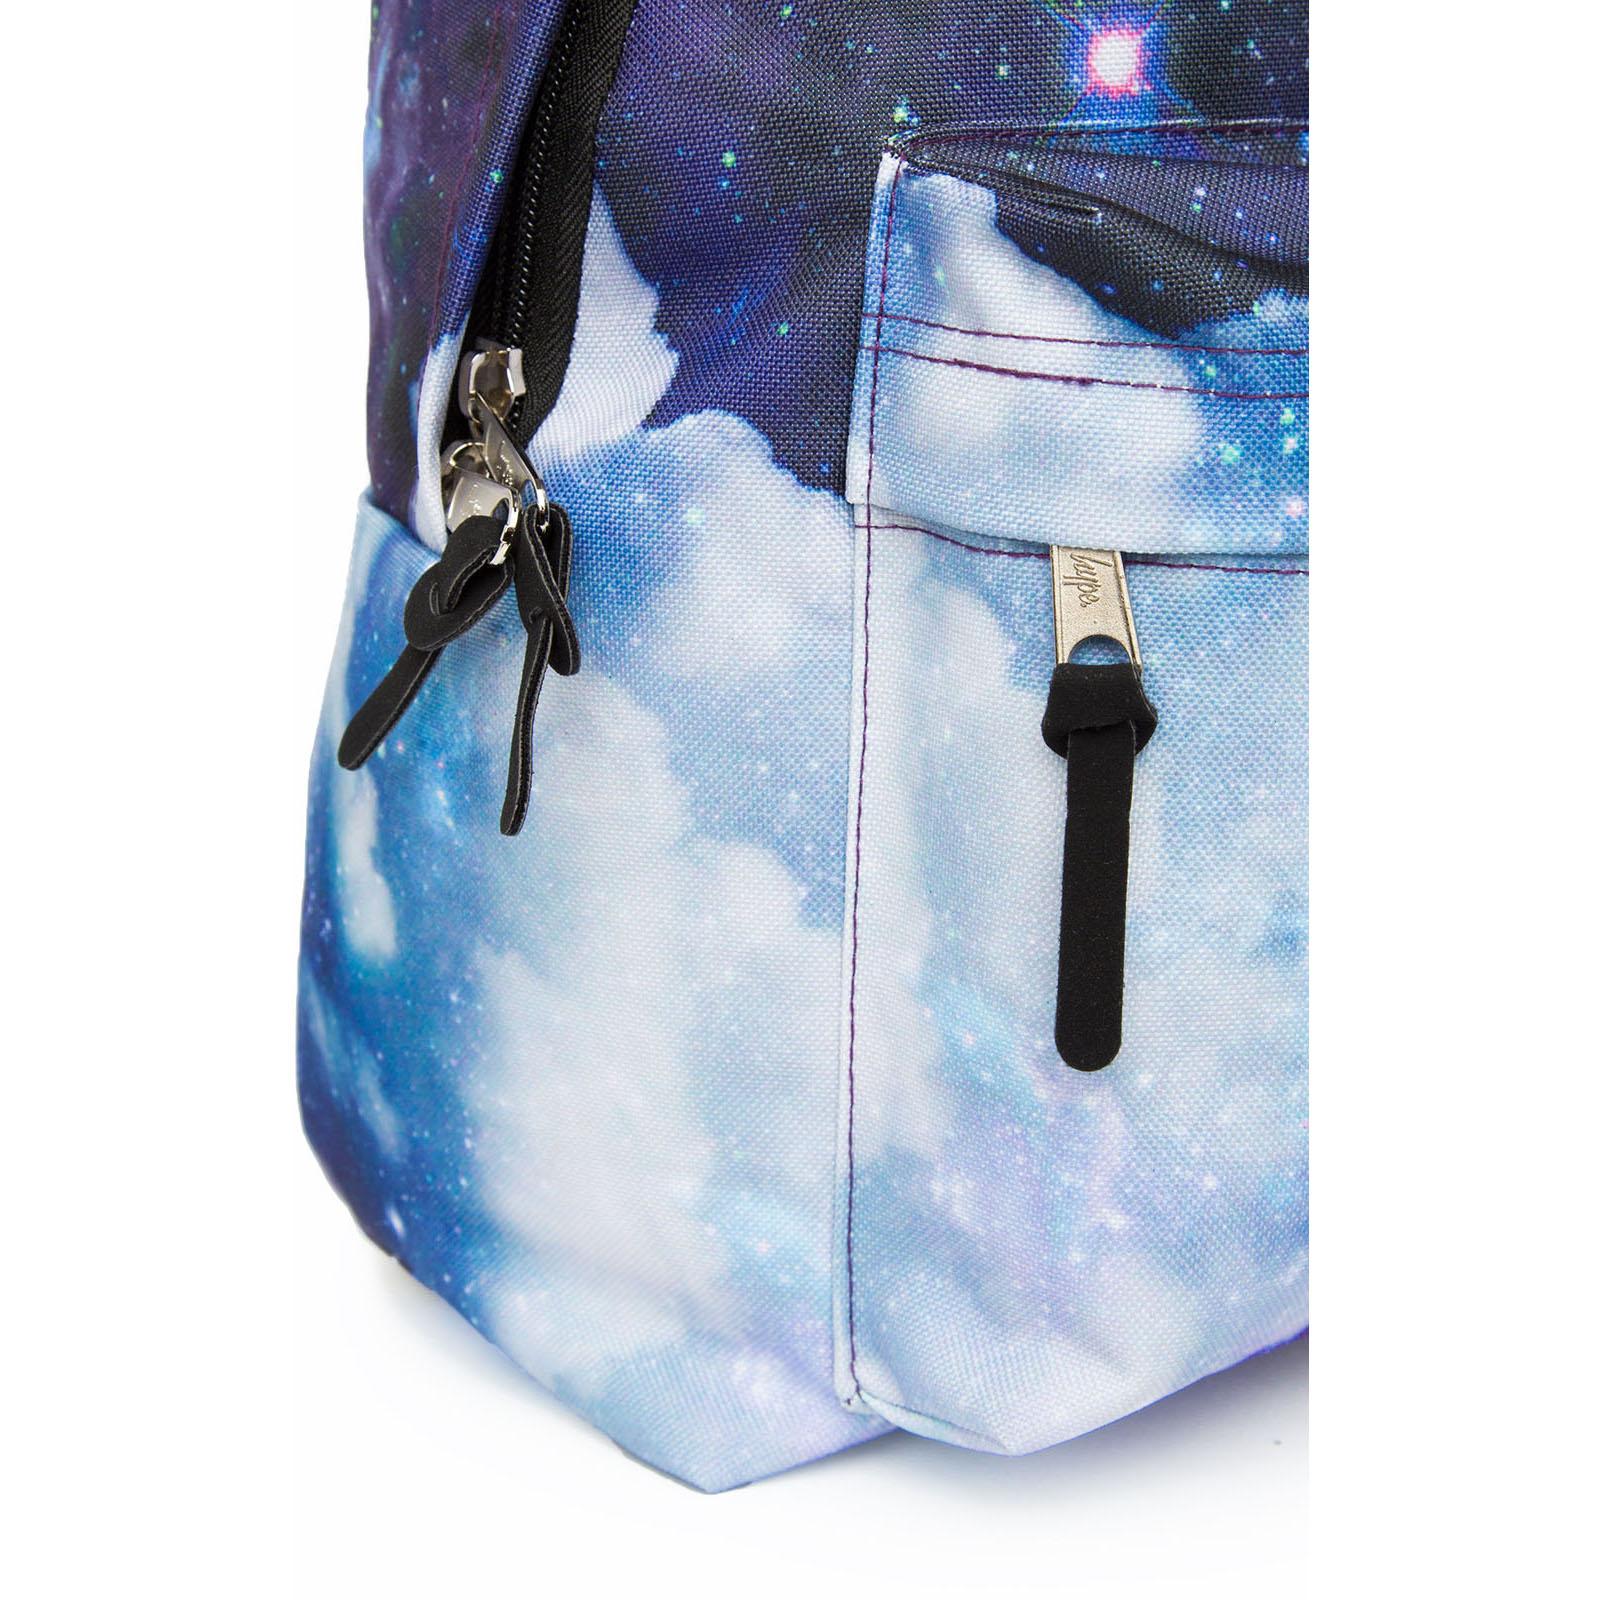 Unisexe-Hype-Sac-A-Dos-Ecole-Gym-SACS-pochettes-pencil-case miniature 57